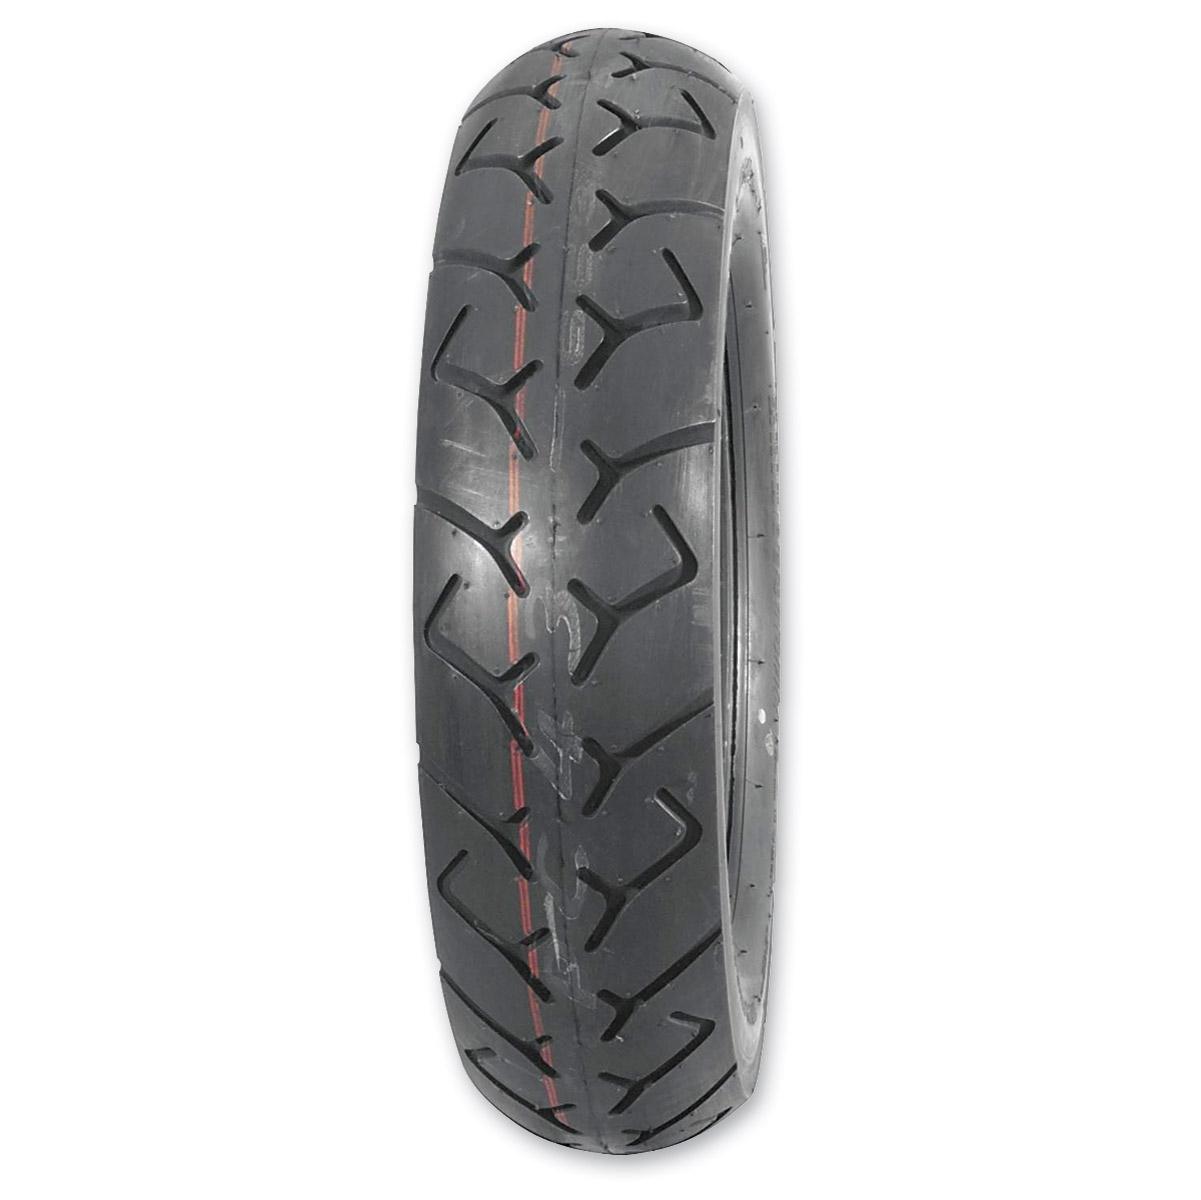 Bridgestone Exedra G702G 150/90B15 Rear Tire